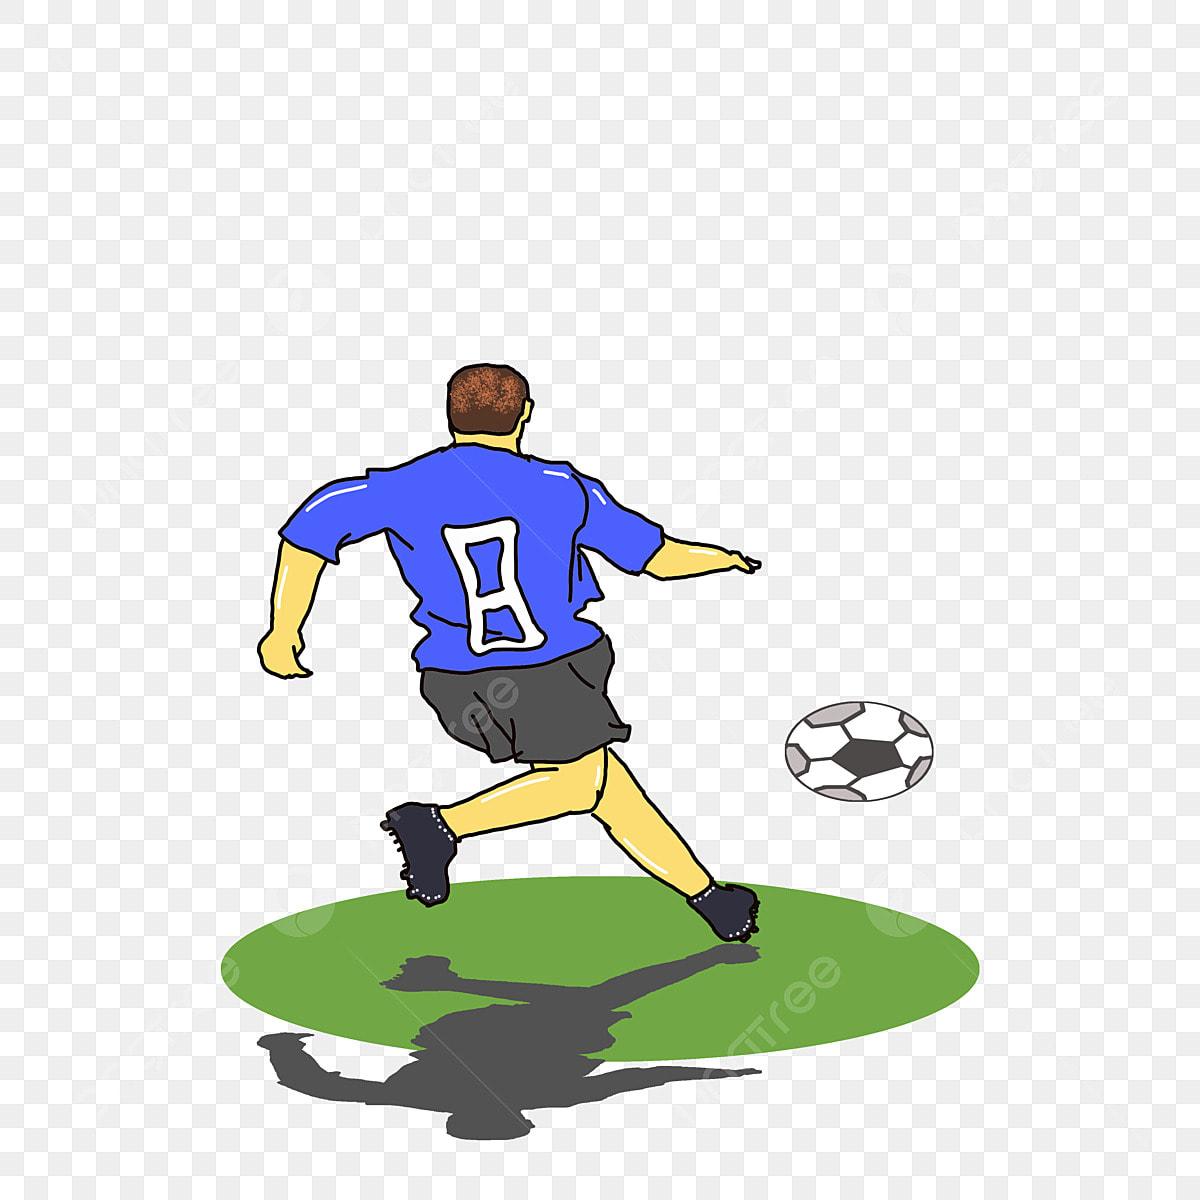 Weltcup Fussball Fussballspiel Karikaturhand Gezeichnet Tritt